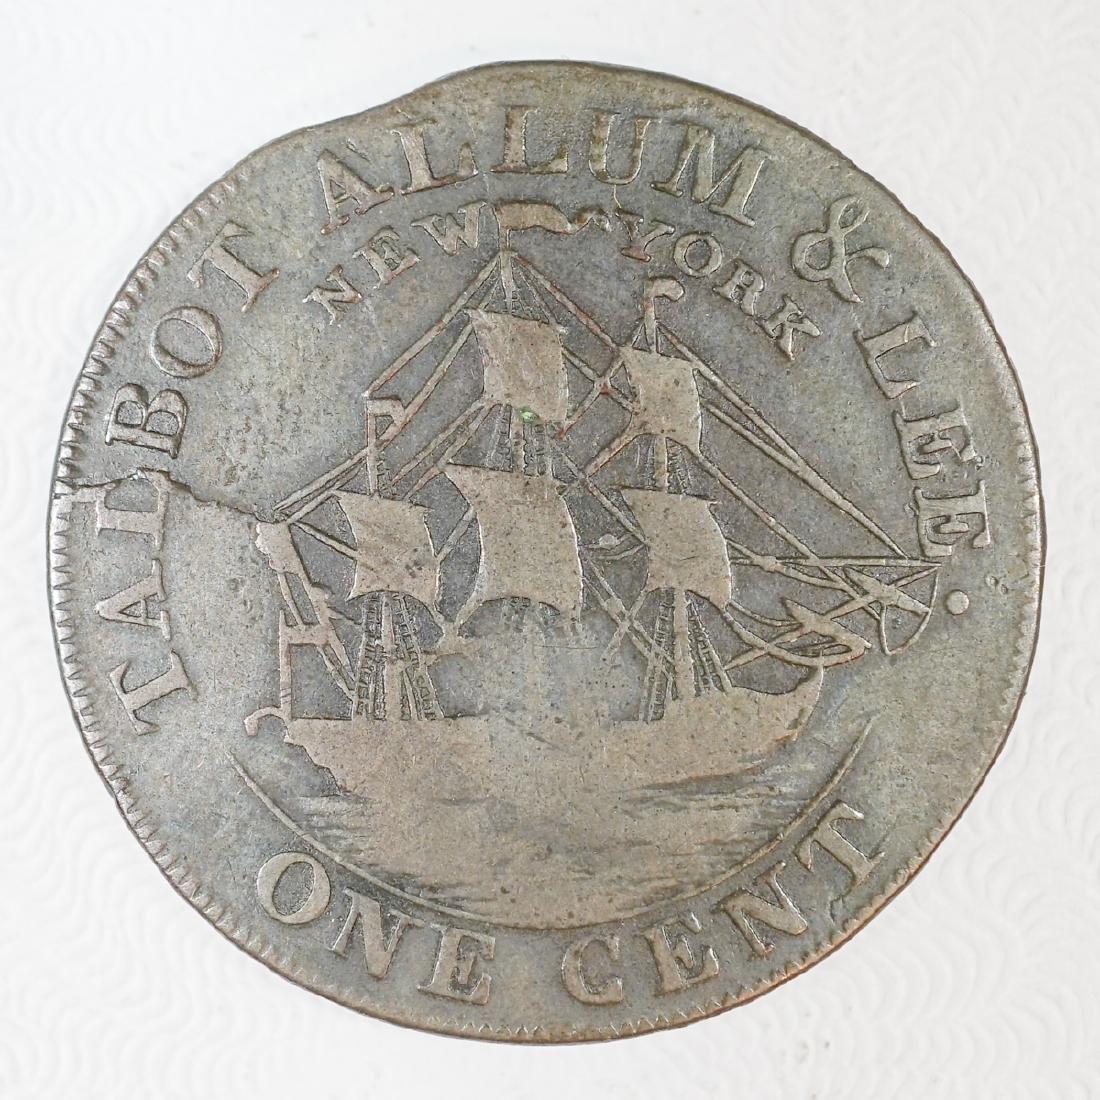 1794 Talbot, Allum & Lee, One Cent, New York - 2